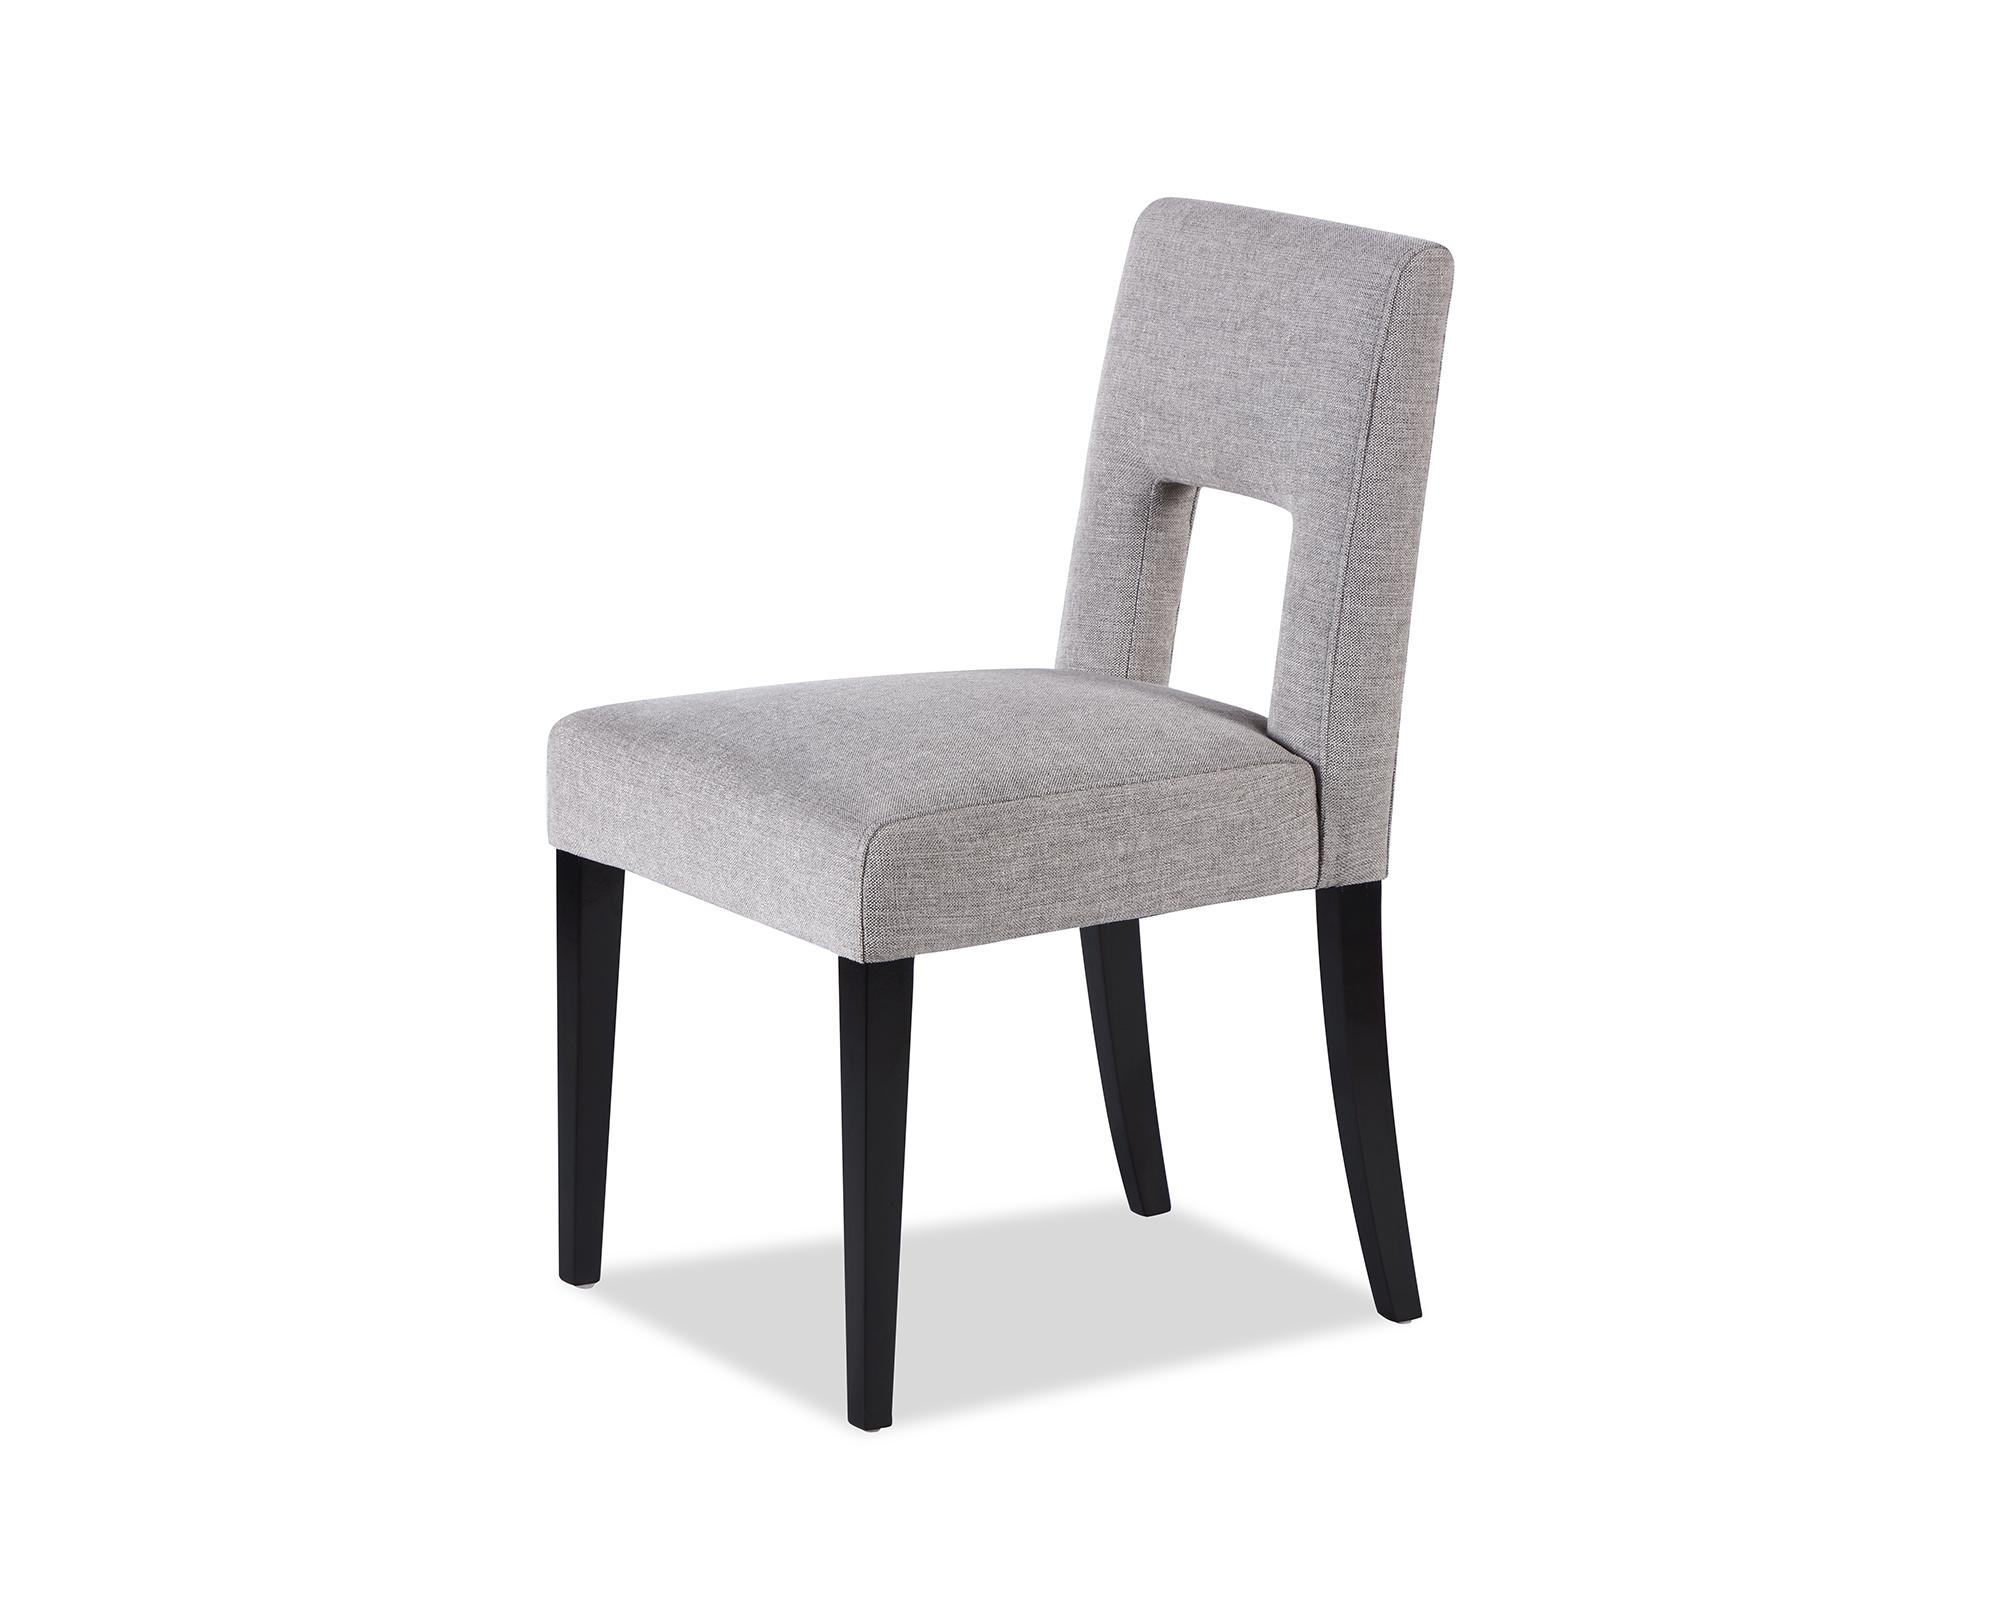 L&E Venice Dining Chair – Ash Grey Chenille (MY-DCH-016) (4)